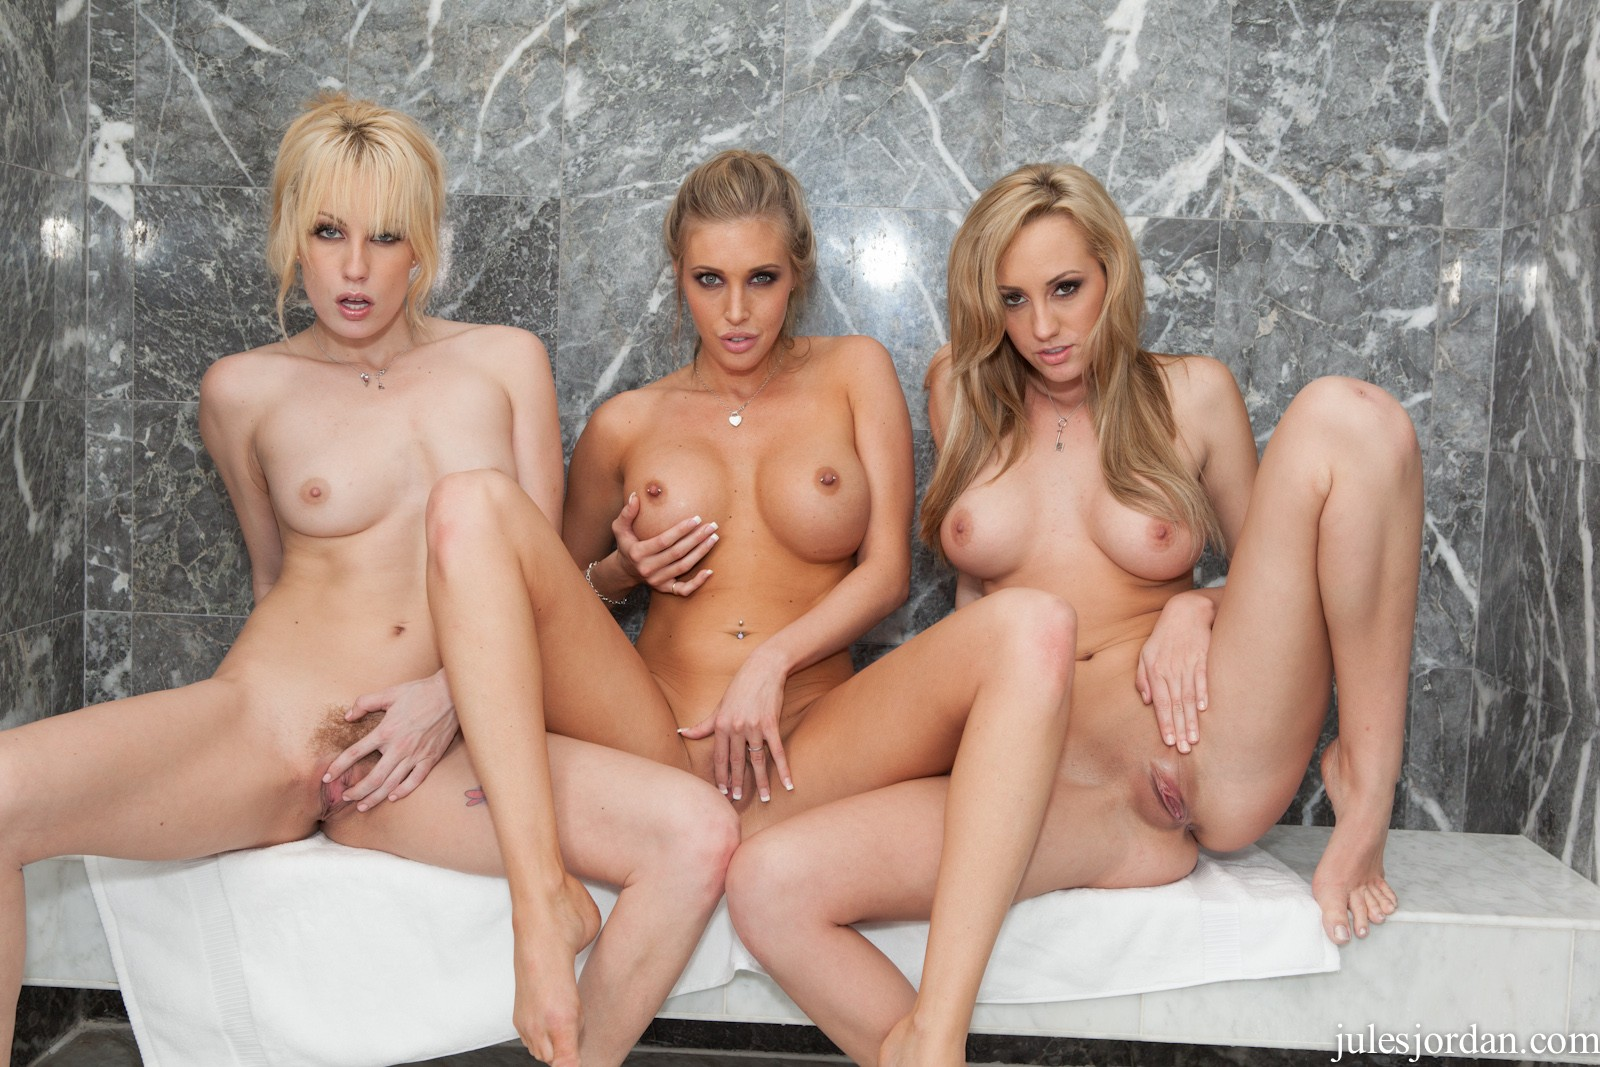 cdn fhg julesjordan porn stars samanthasaint JulesJordan 1 julesjordan the insatiable miss saint scene6 photos 1020